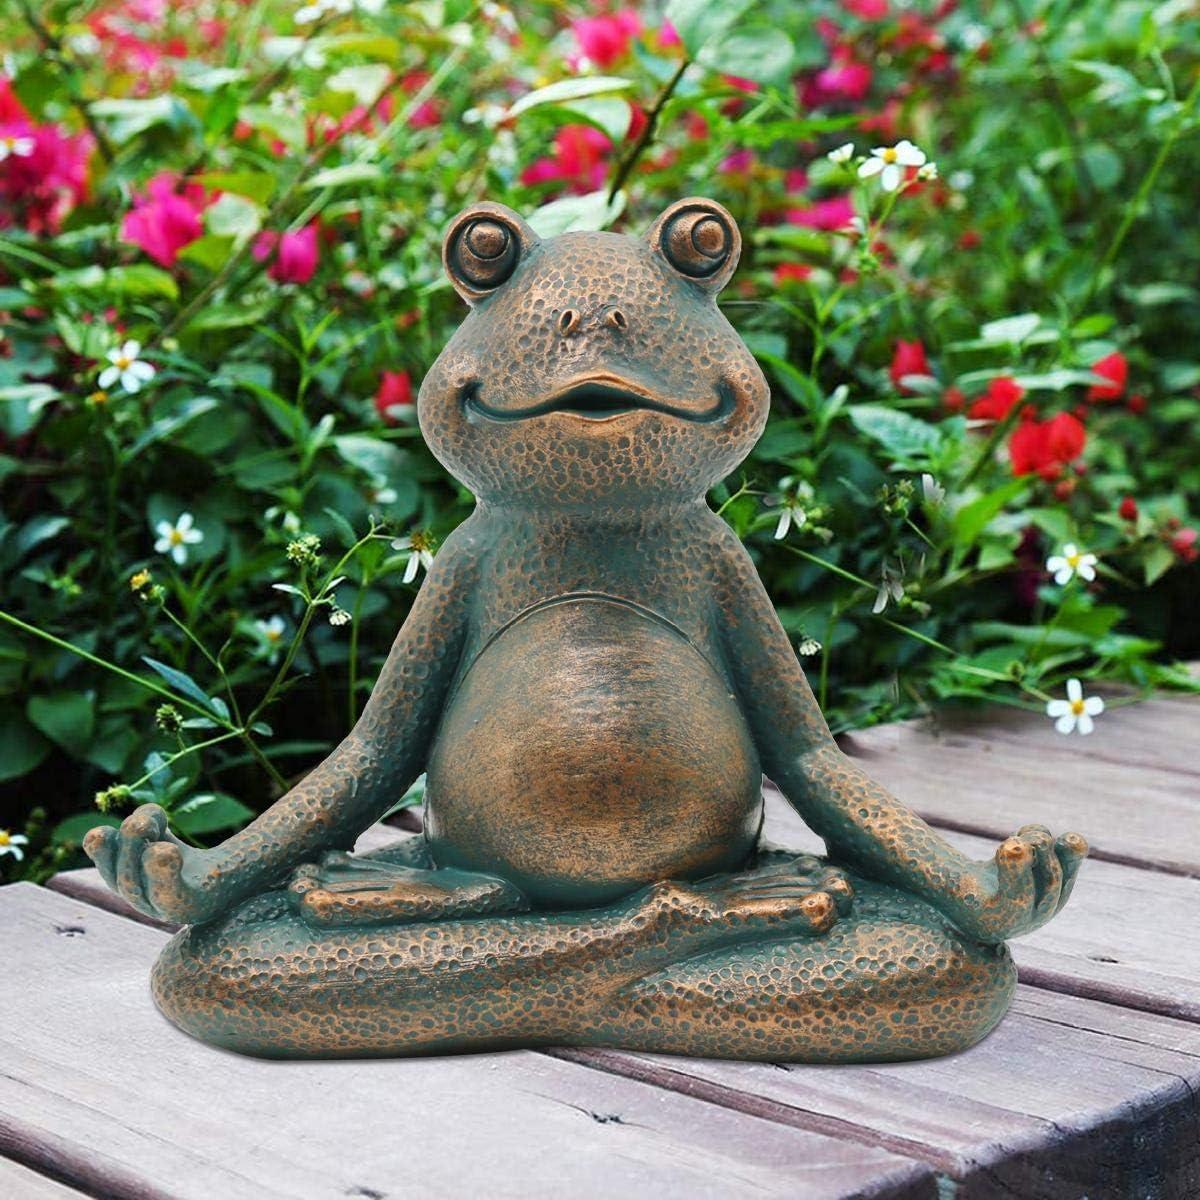 Nacome Meditating Frog Miniature Figurine Yoga New Orleans Mall Garden Zen S Branded goods